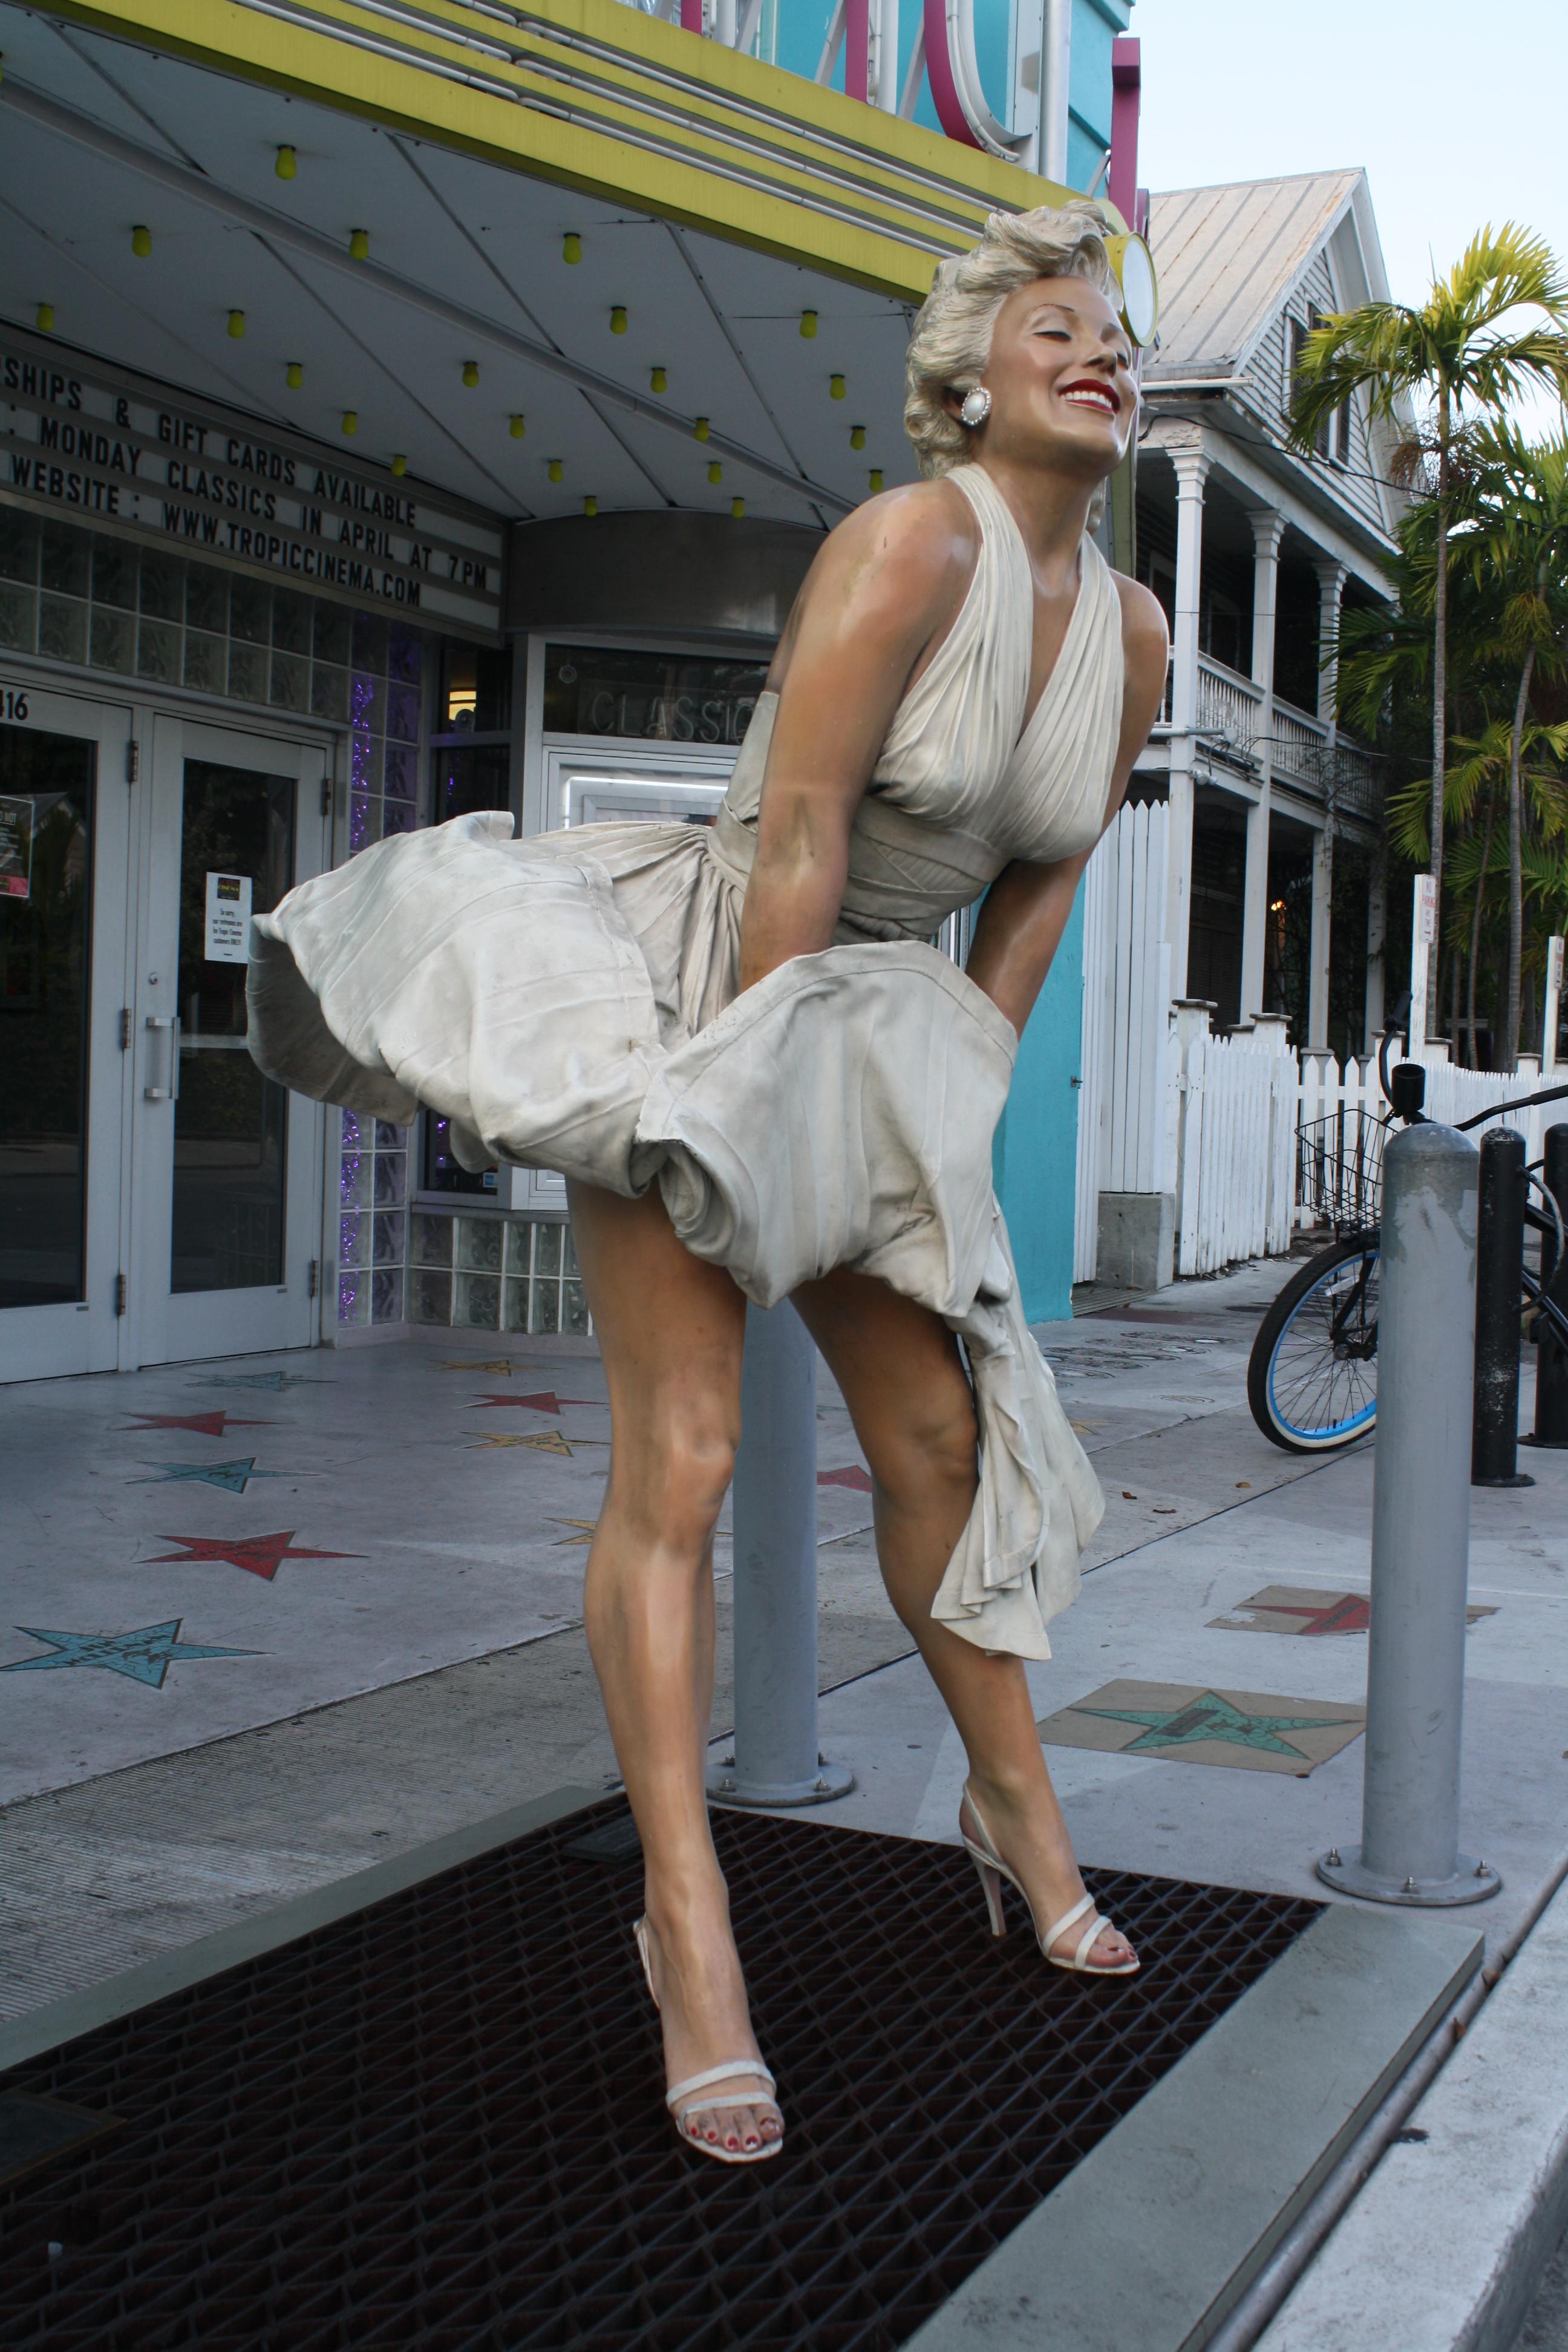 monroe marilyn dress blowing statue photo photos history